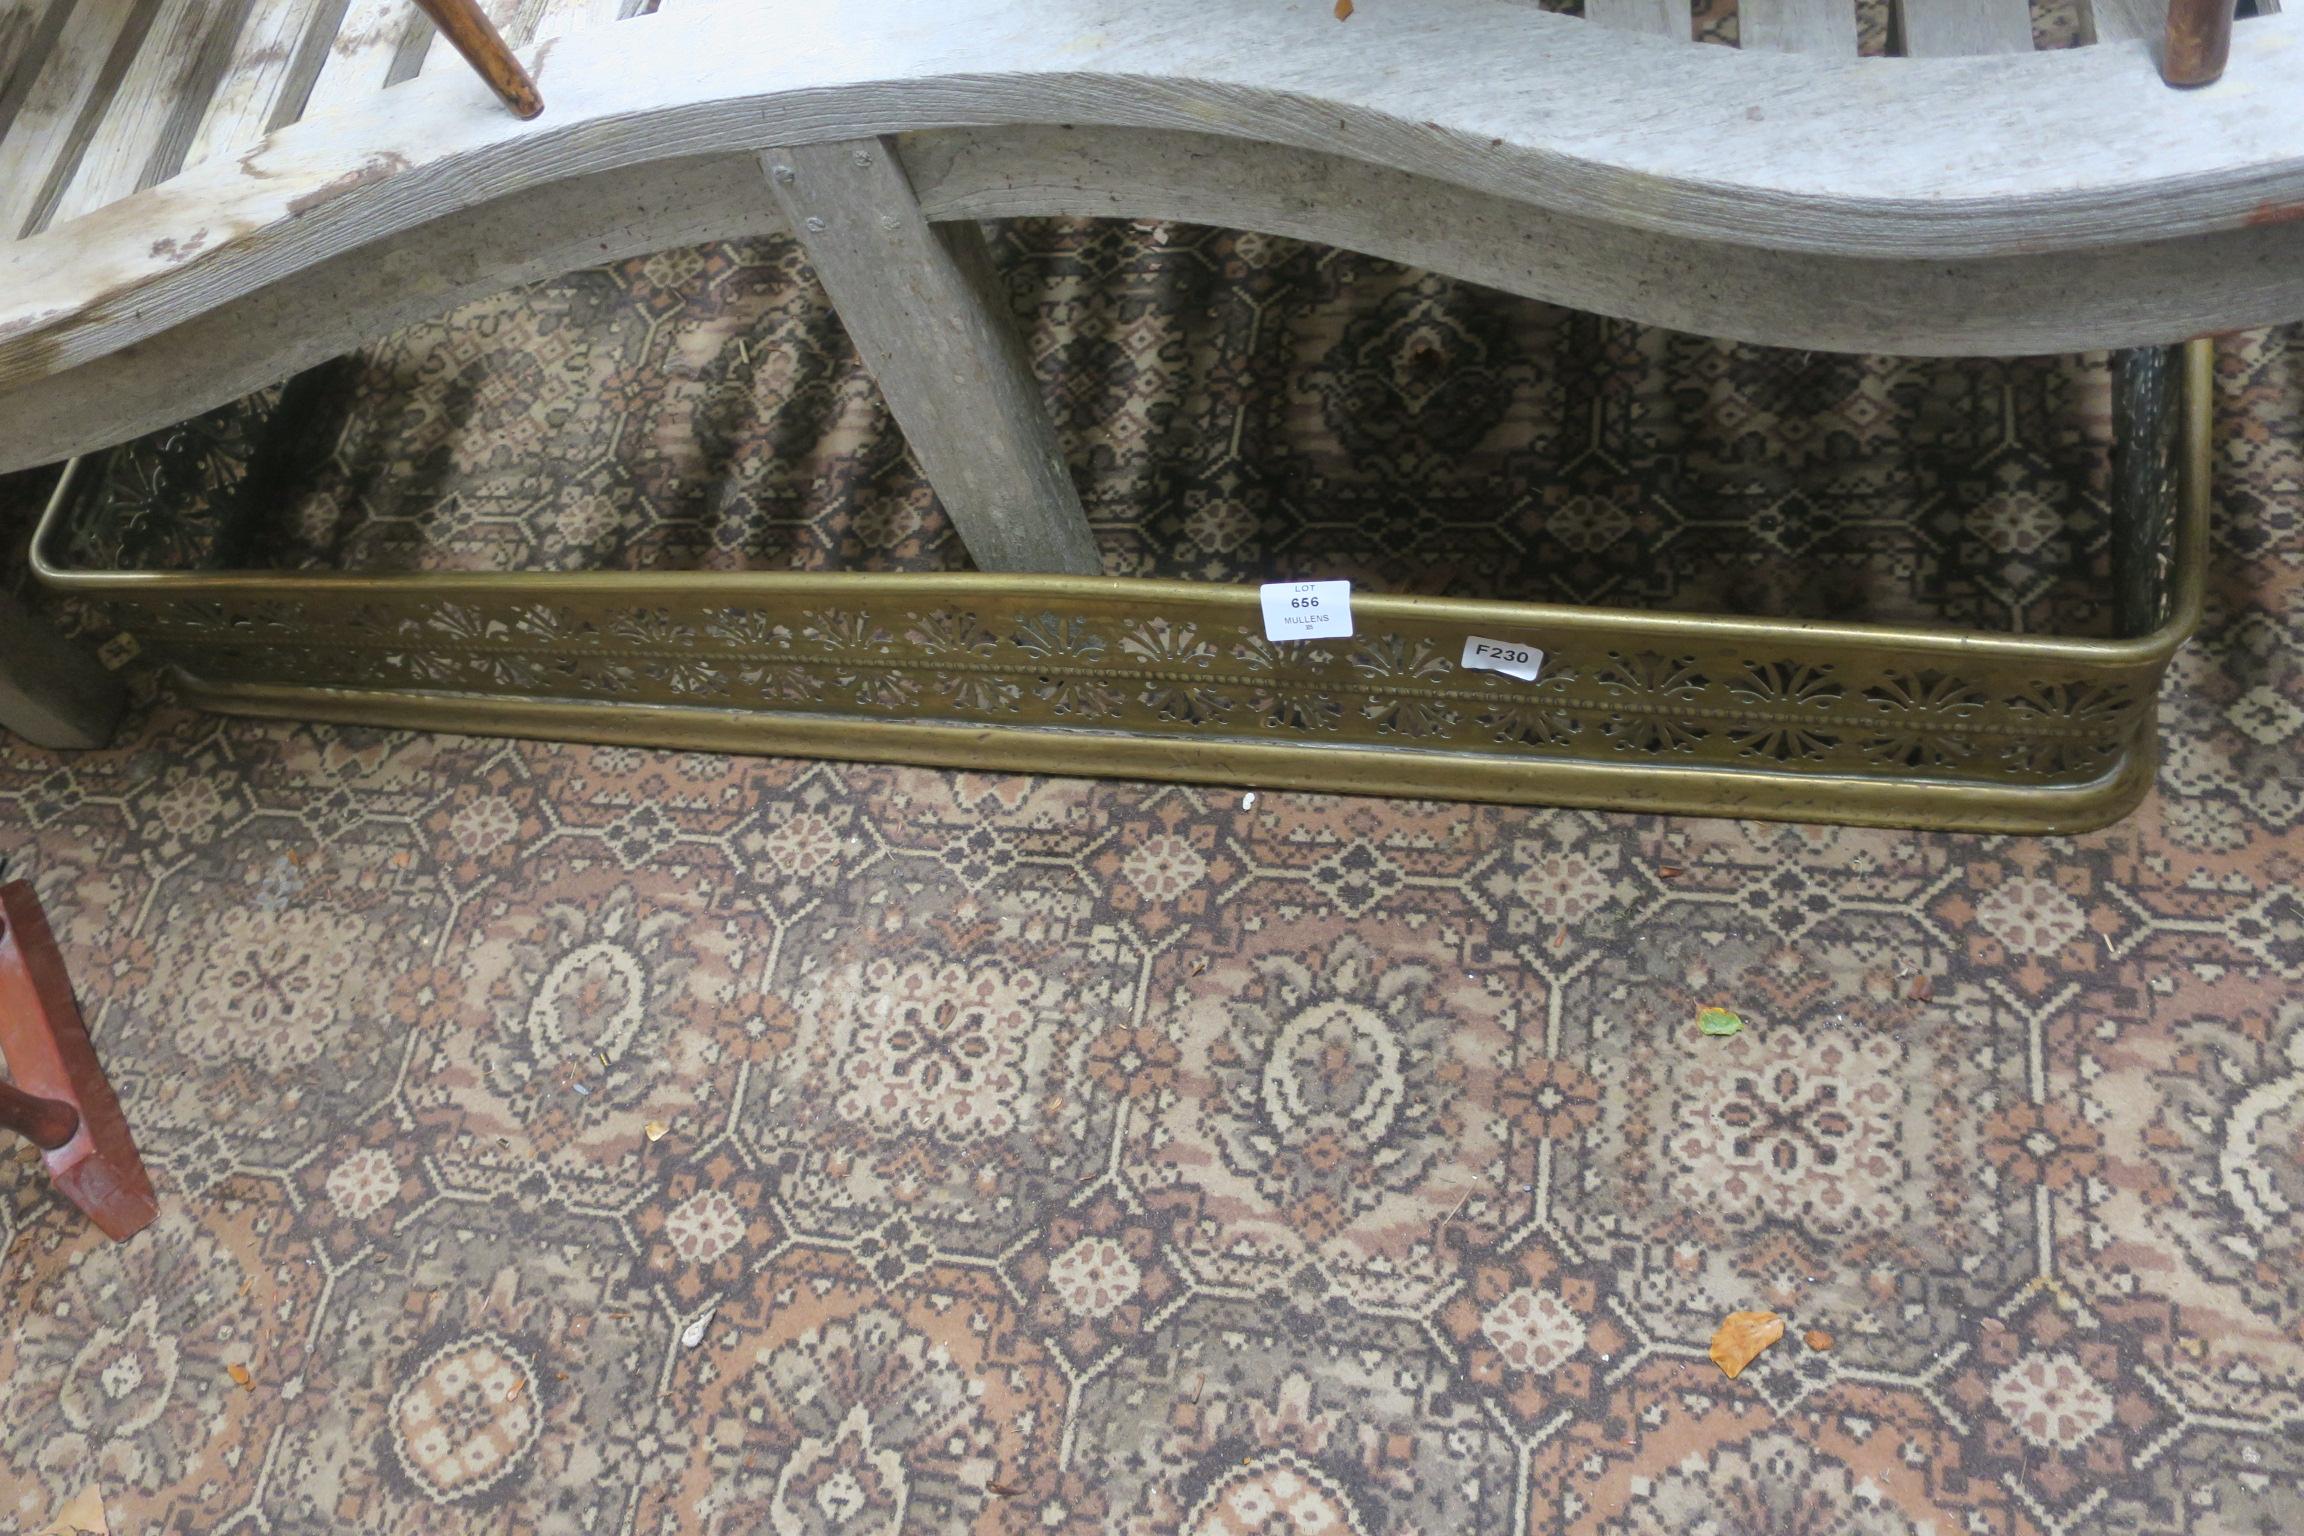 Lot 656 - A 19TH CENTURY BRASS FENDER with pierced frieze